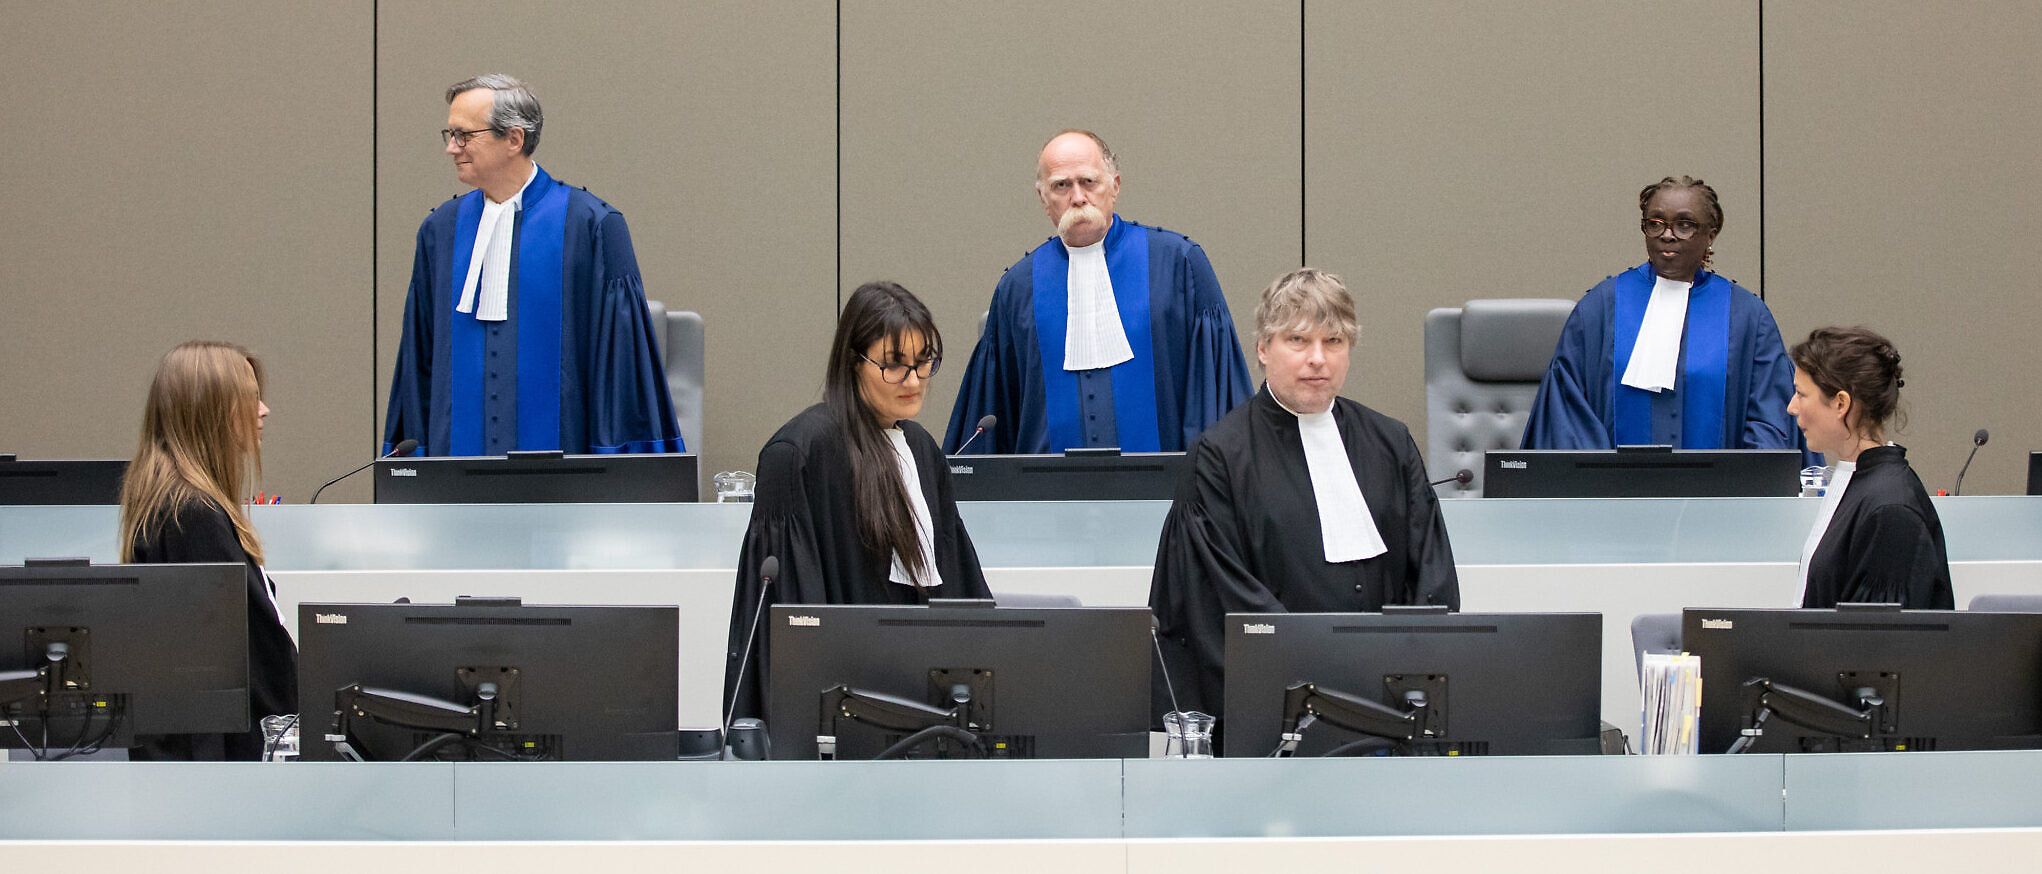 The Pre-Trial Chamber of the International Criminal Court (ICC), composed of Judge Péter Kovács, Presiding Judge, Judge Marc Perrin de Brichambaut and Judge Reine Alapini-Gansou (courtesy ICC)